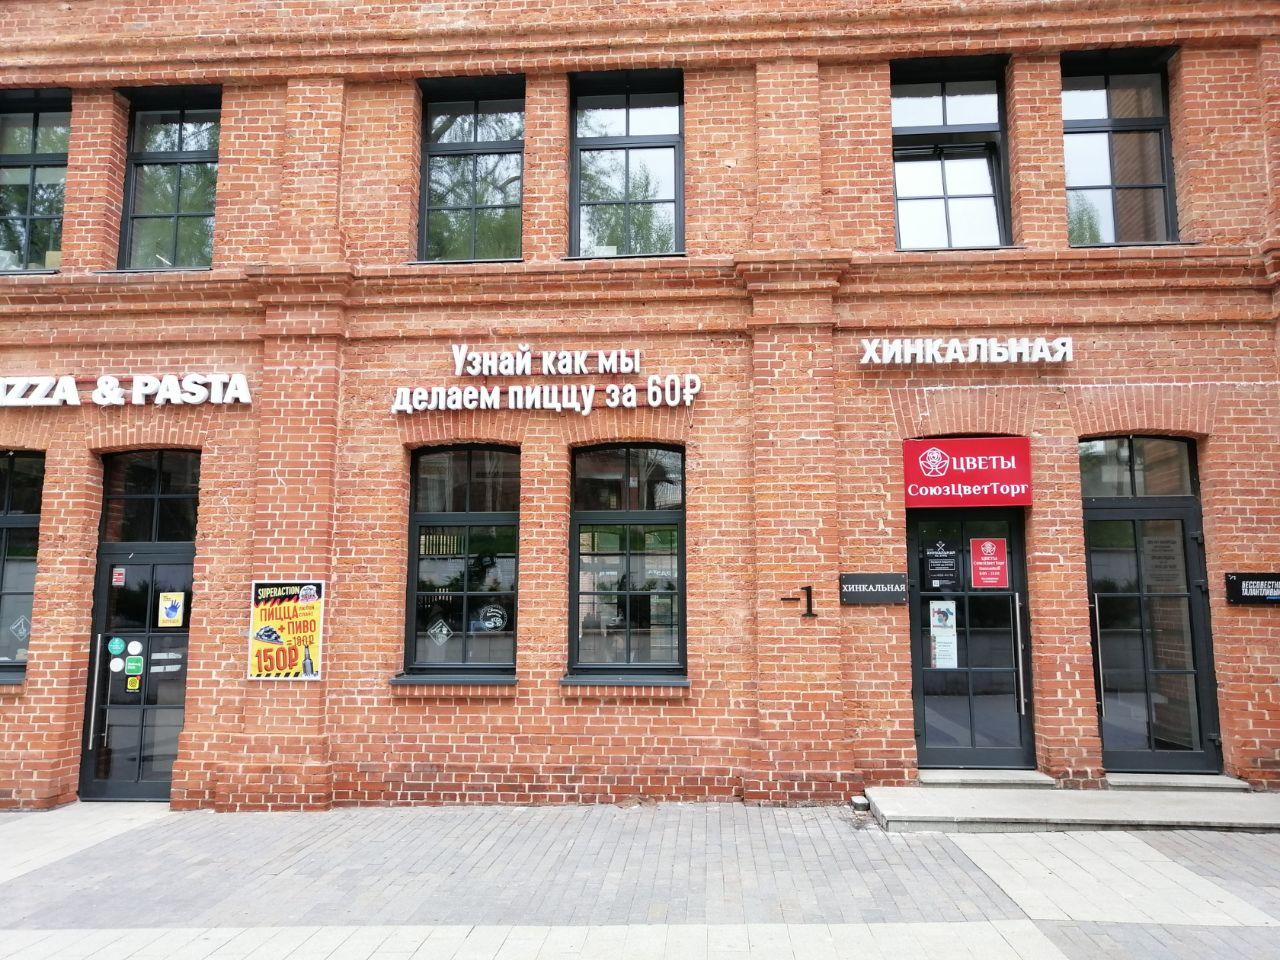 Бизнес Центр Завод Арма (Курский) (Строение 2)